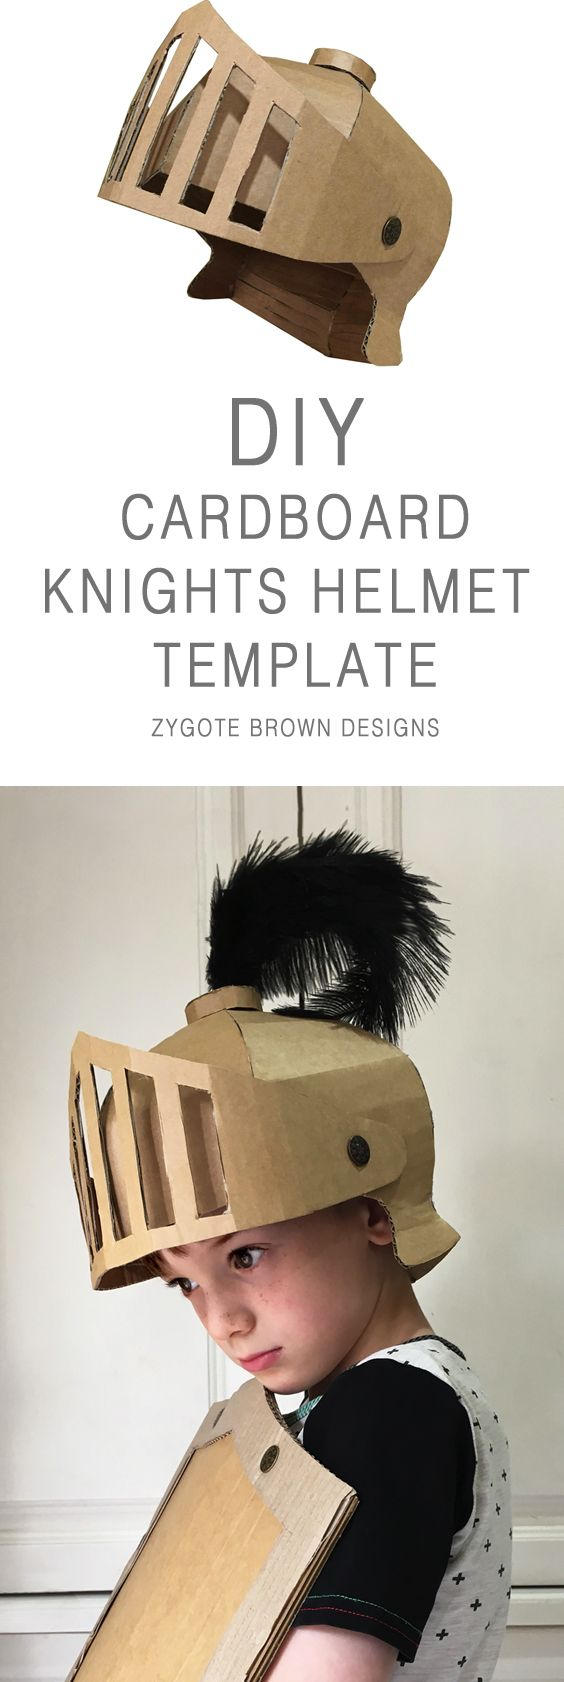 paper knight helmet template.html